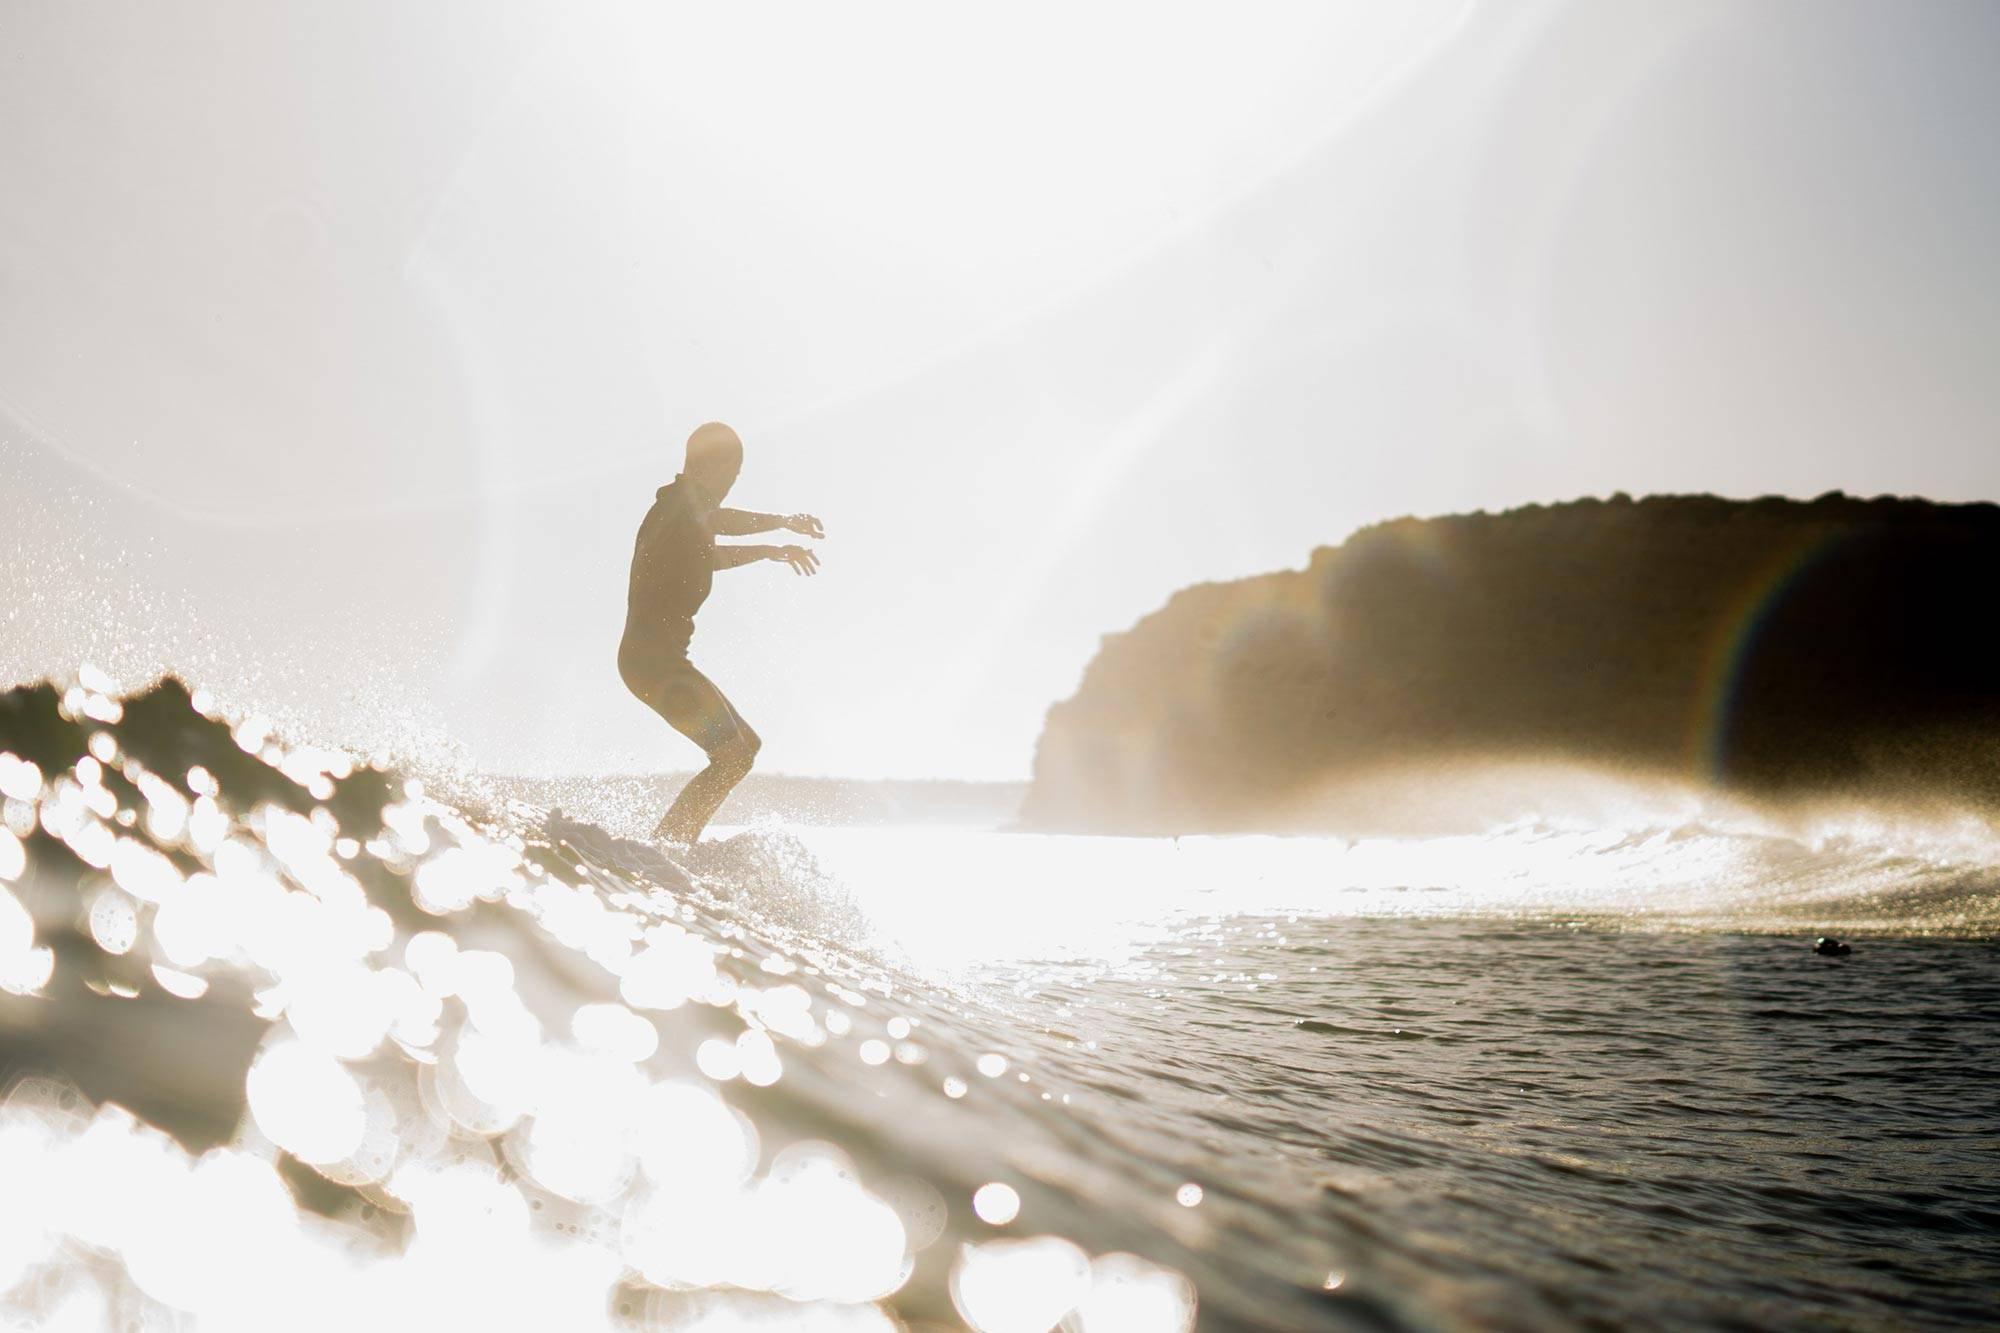 https://www.soulandsurf.com/wp-content/uploads/2021/07/@joeliooo__Surf_Advanced.jpeg Image